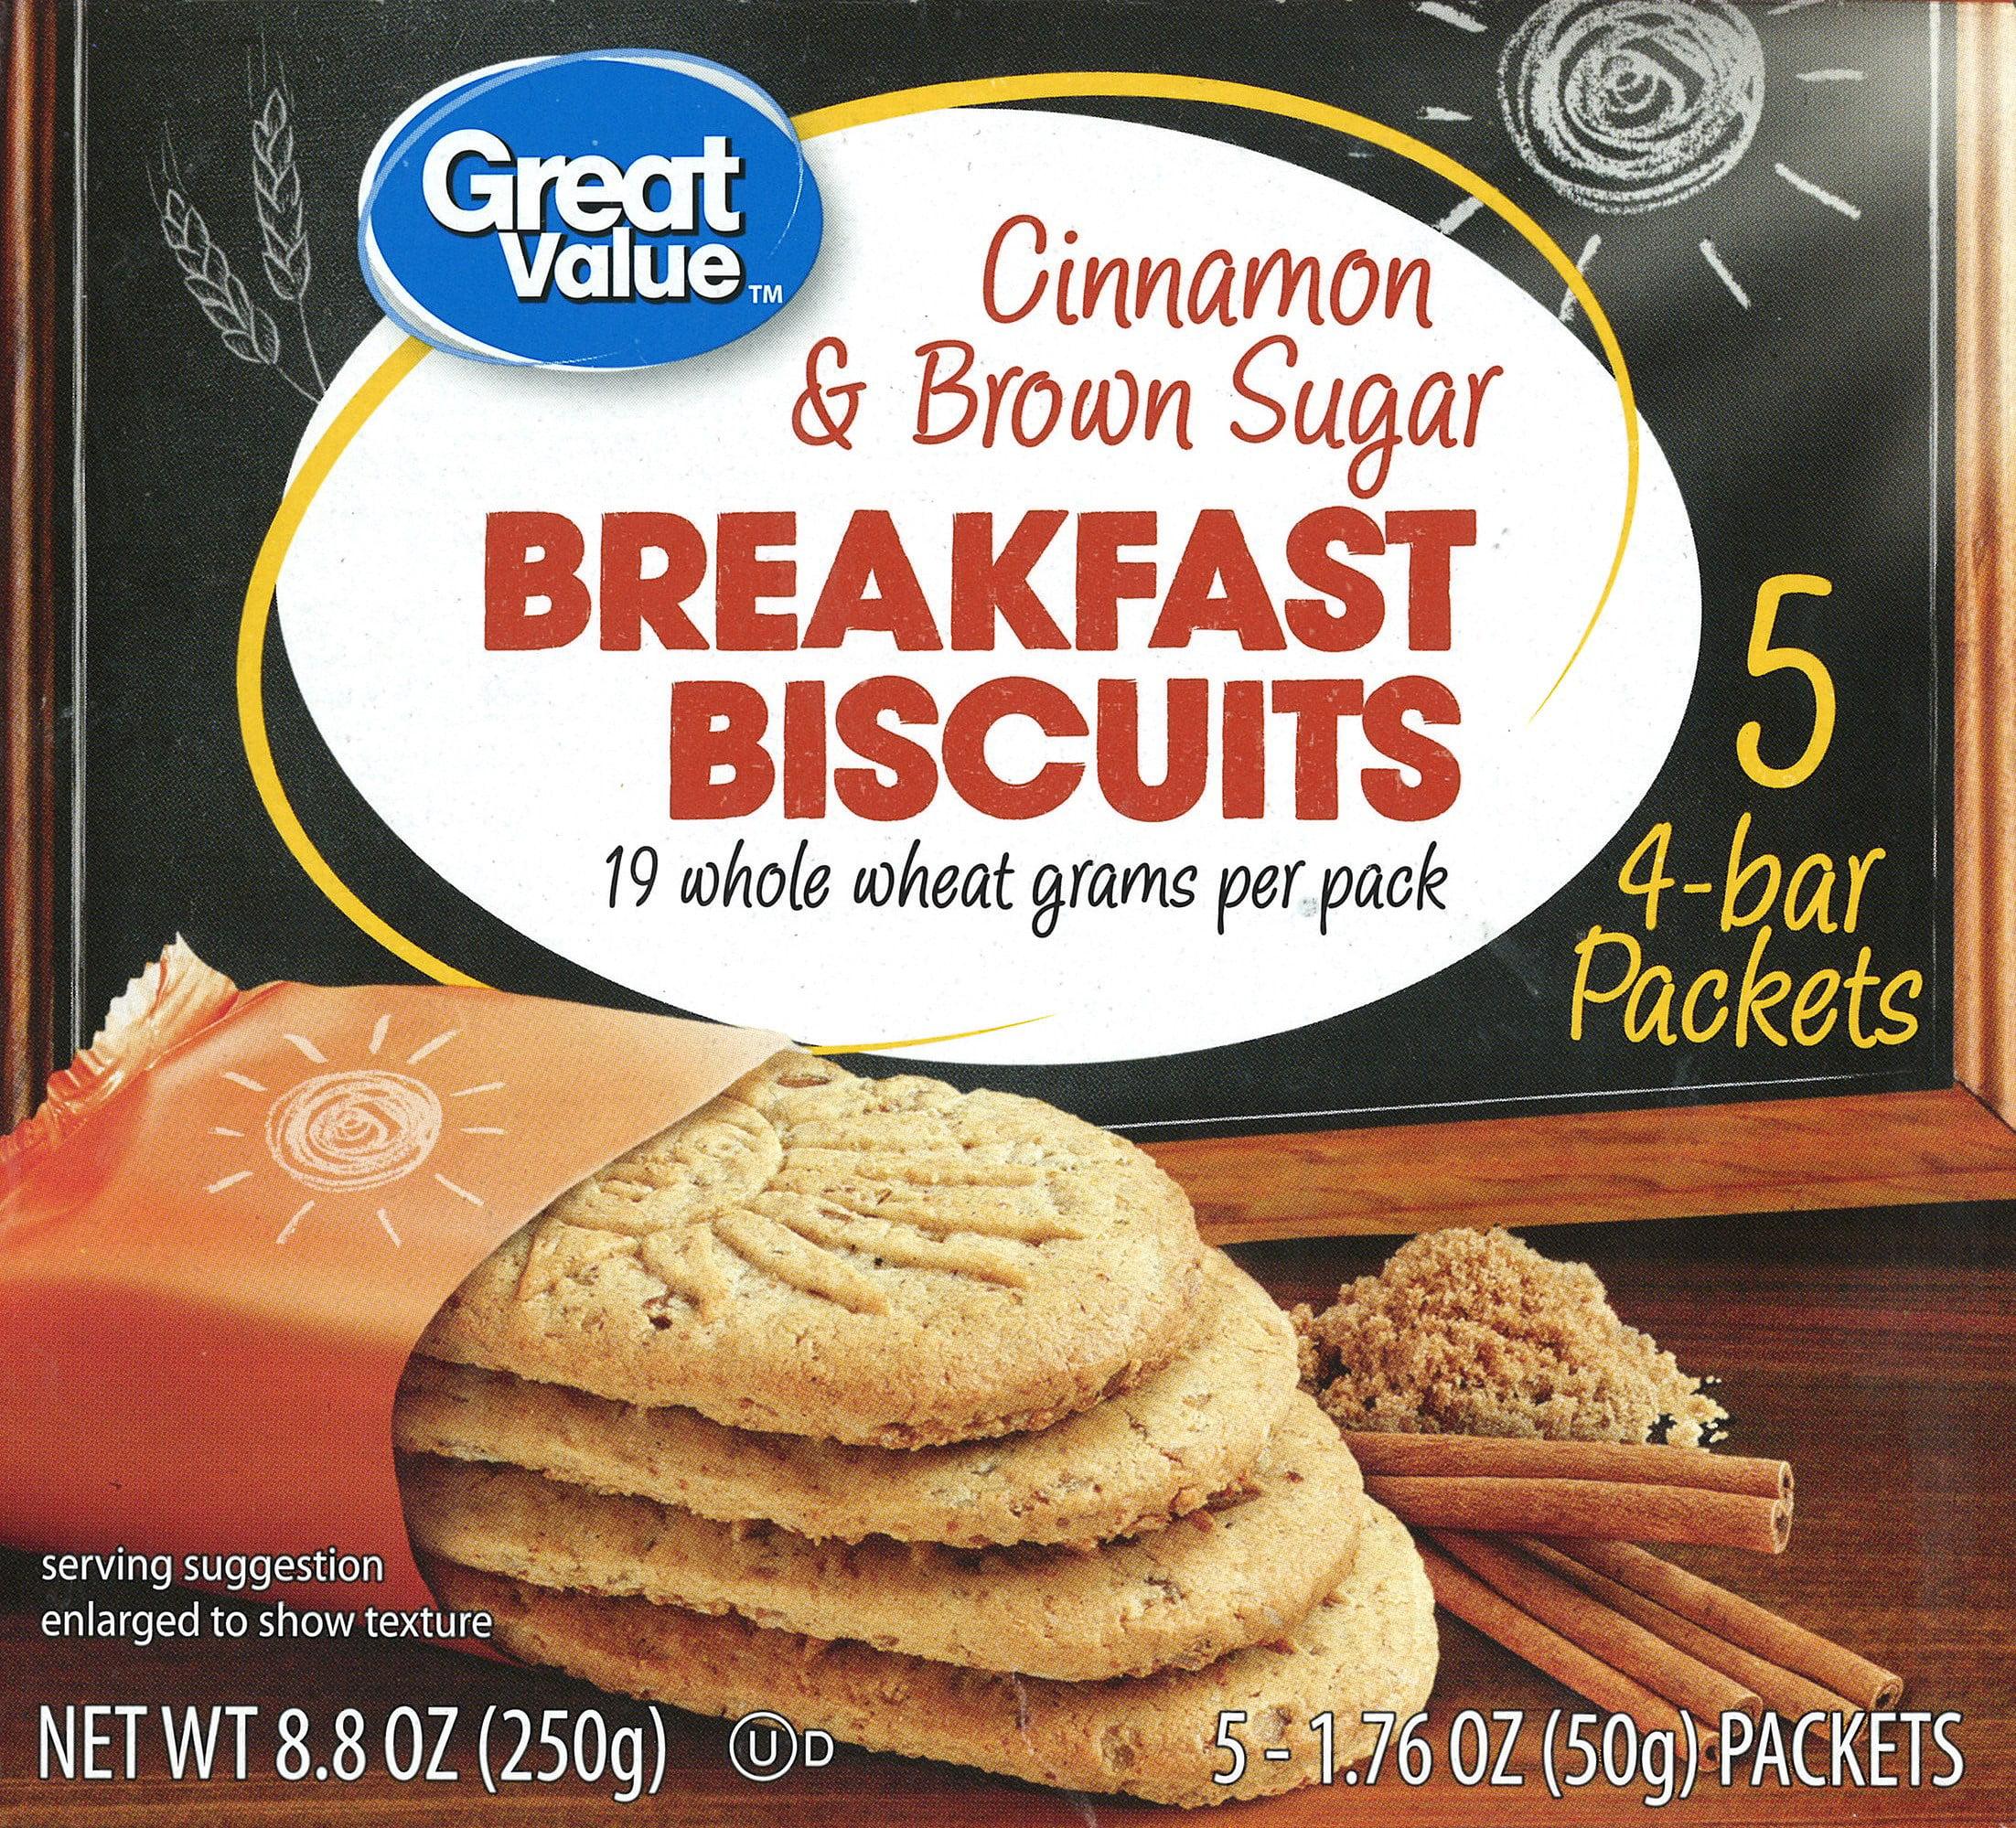 Great Value Cinnamon and Brown Sugar Breakfast Biscuits